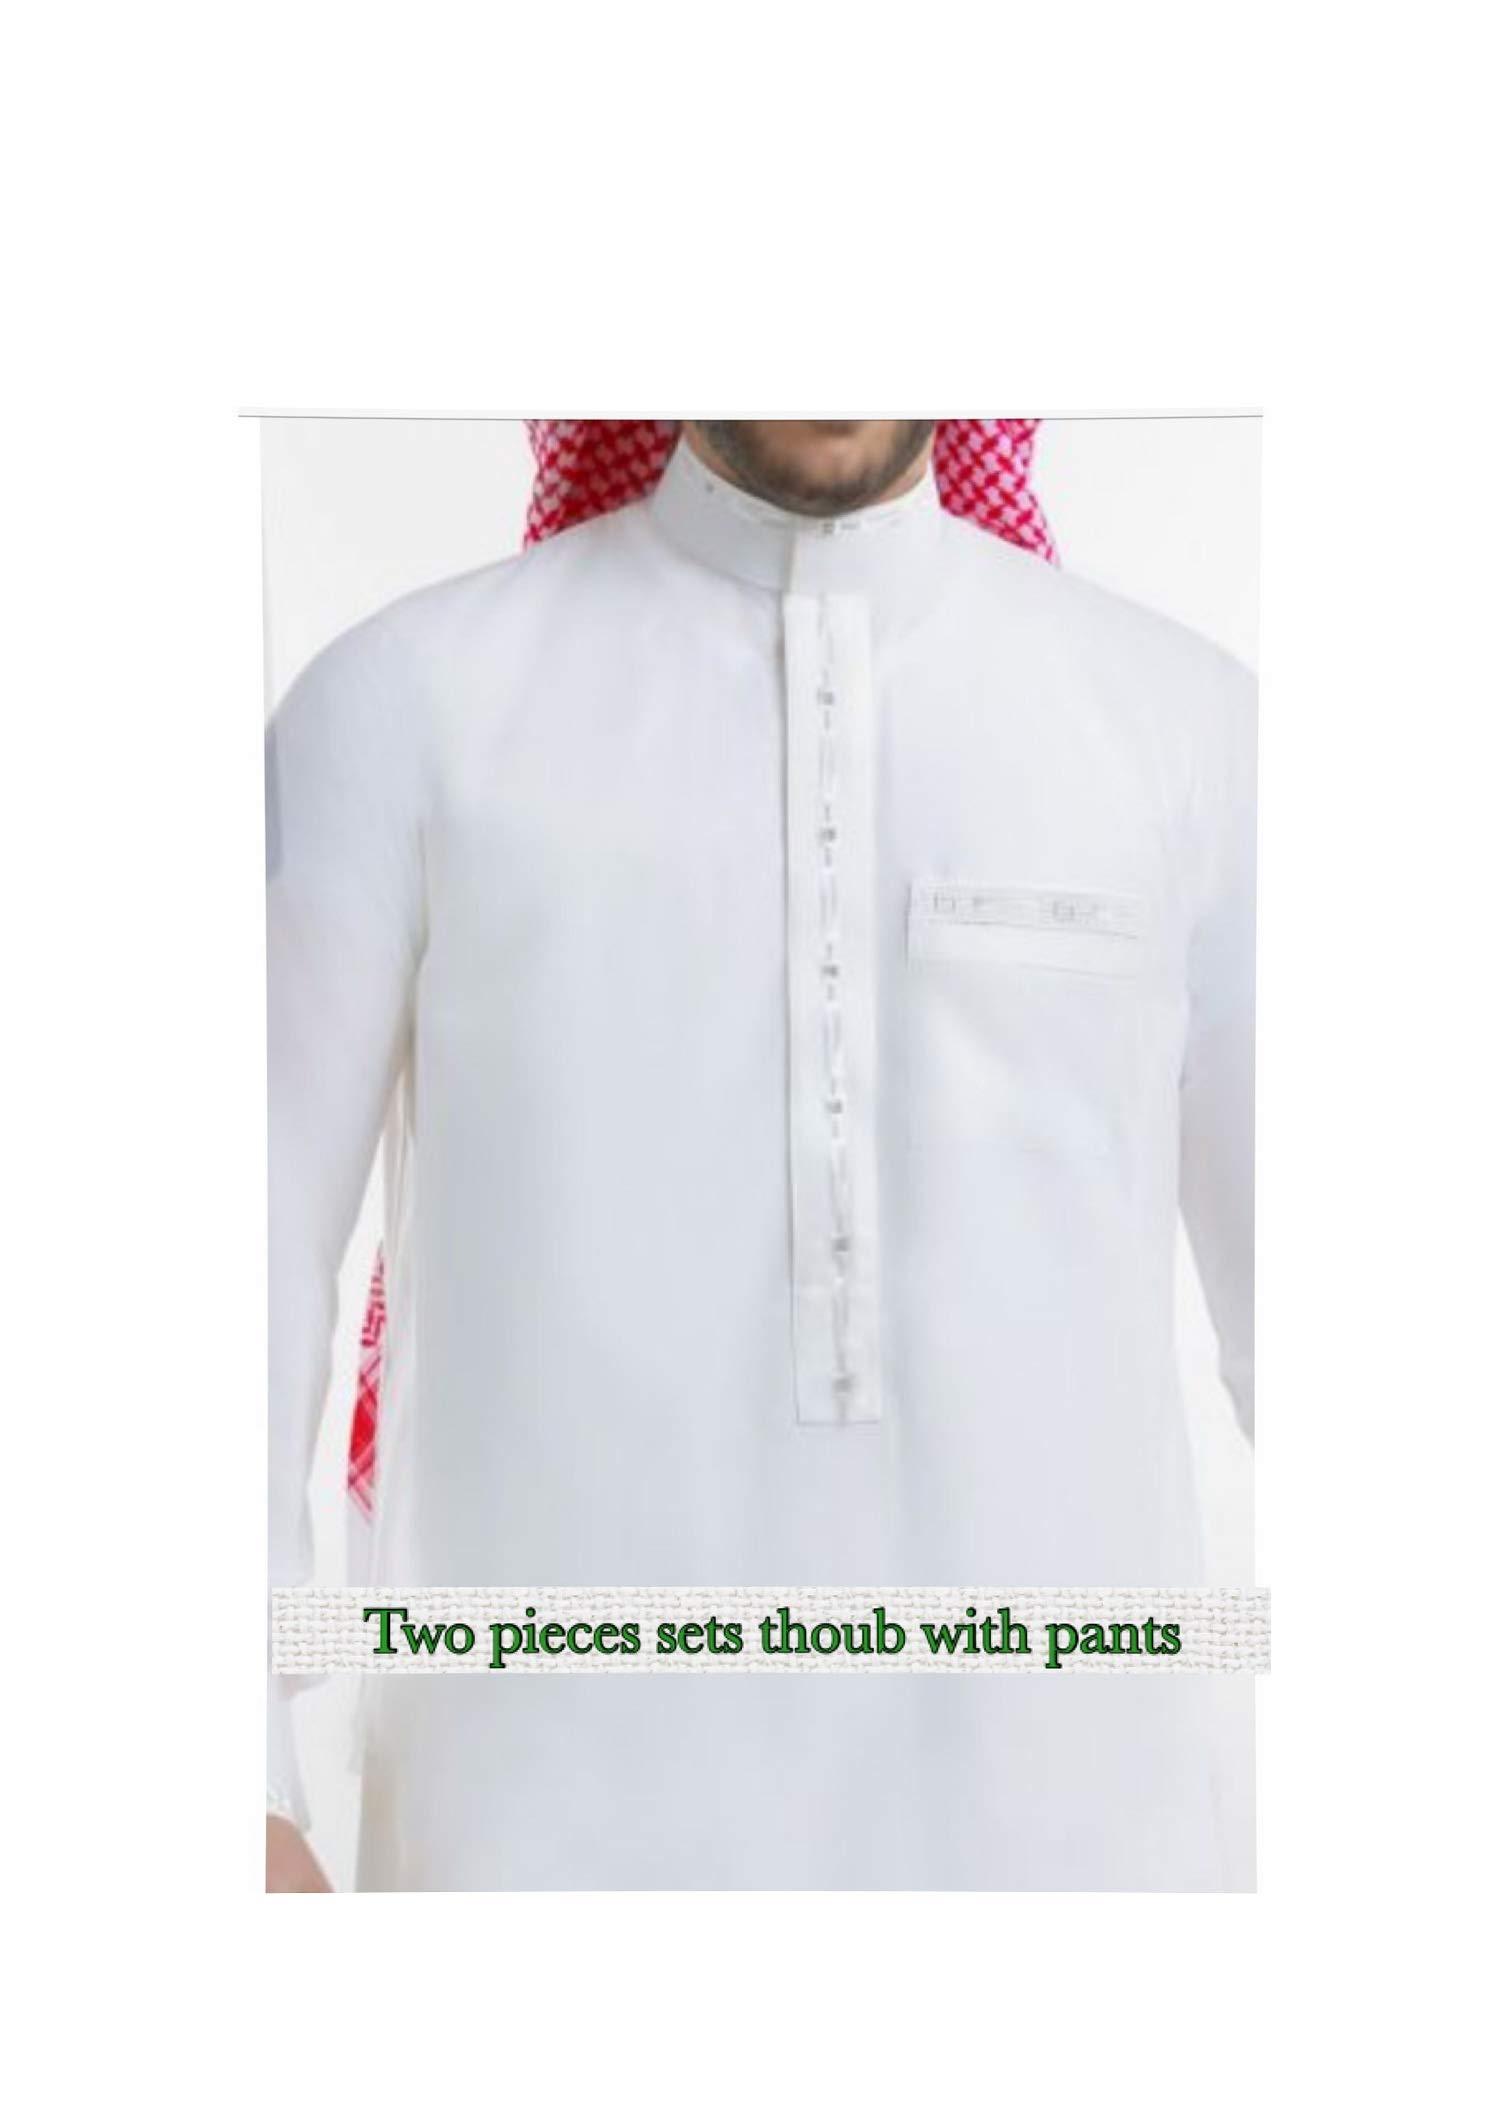 Thobe jubba Dishdasha Thawb Thoub Muslim Islamic Abaya Daffah Kaftan Robe set